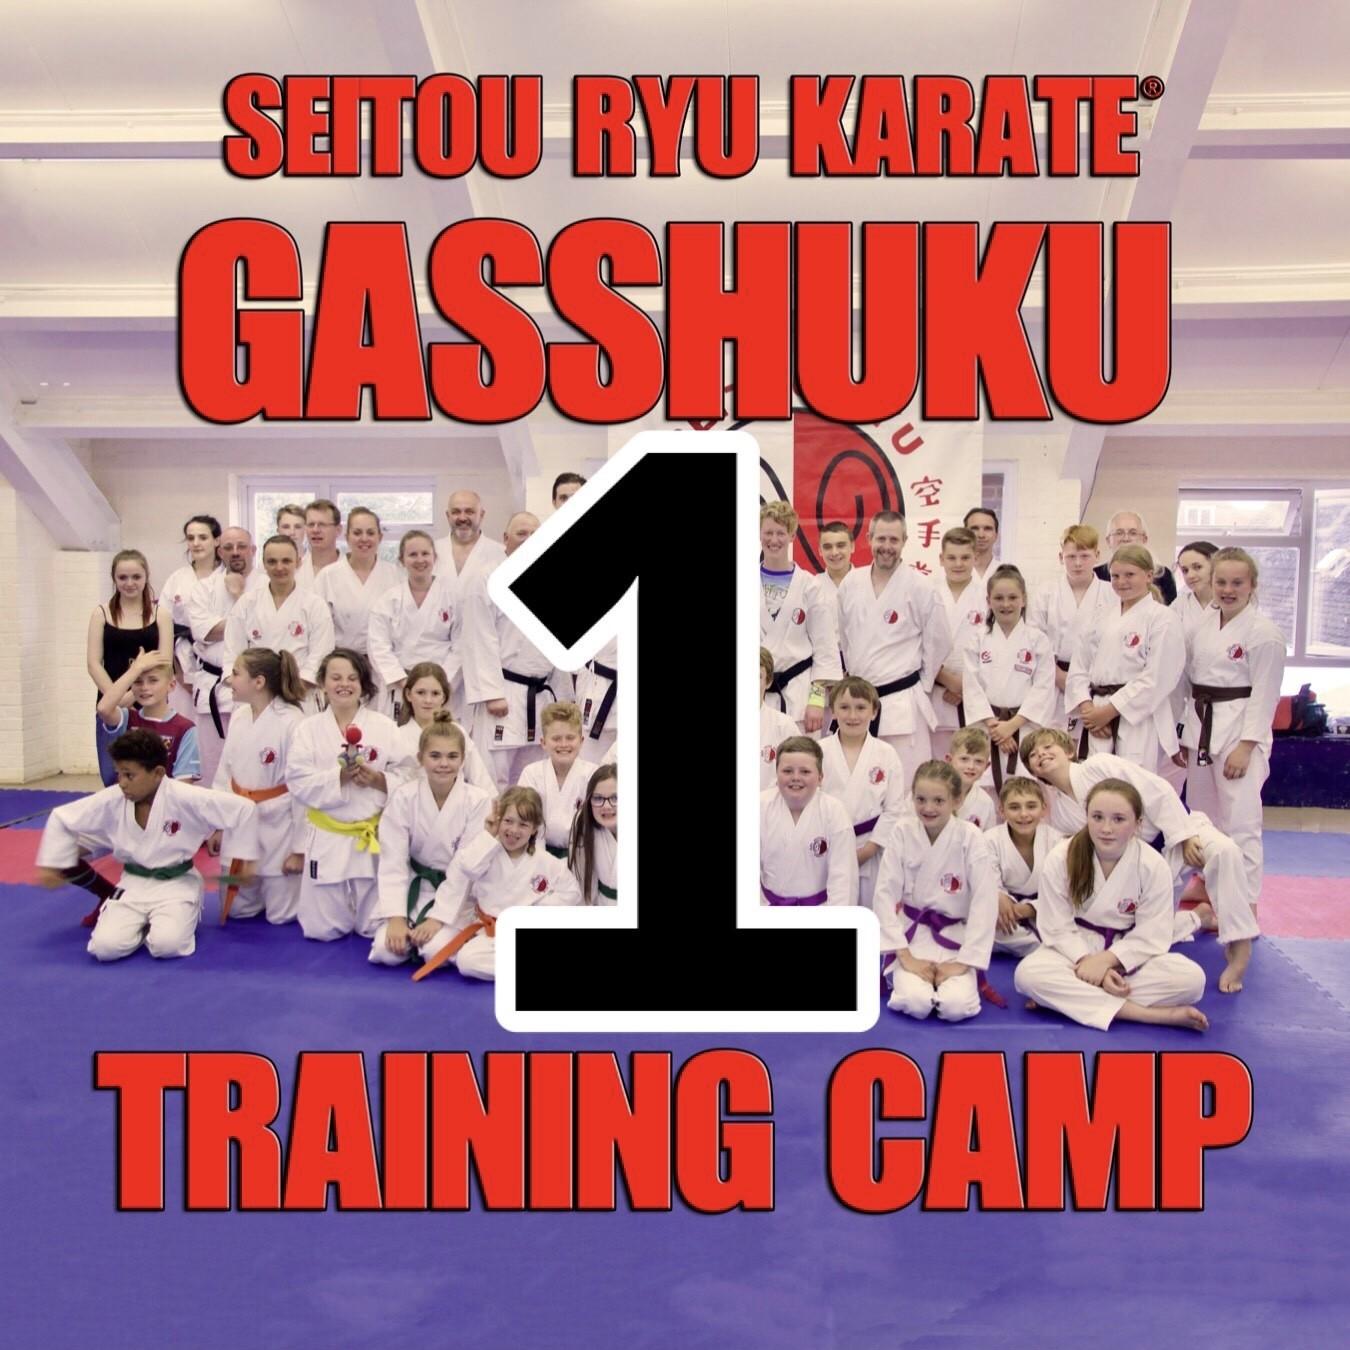 Gasshuku Winter Camp (1 Day)